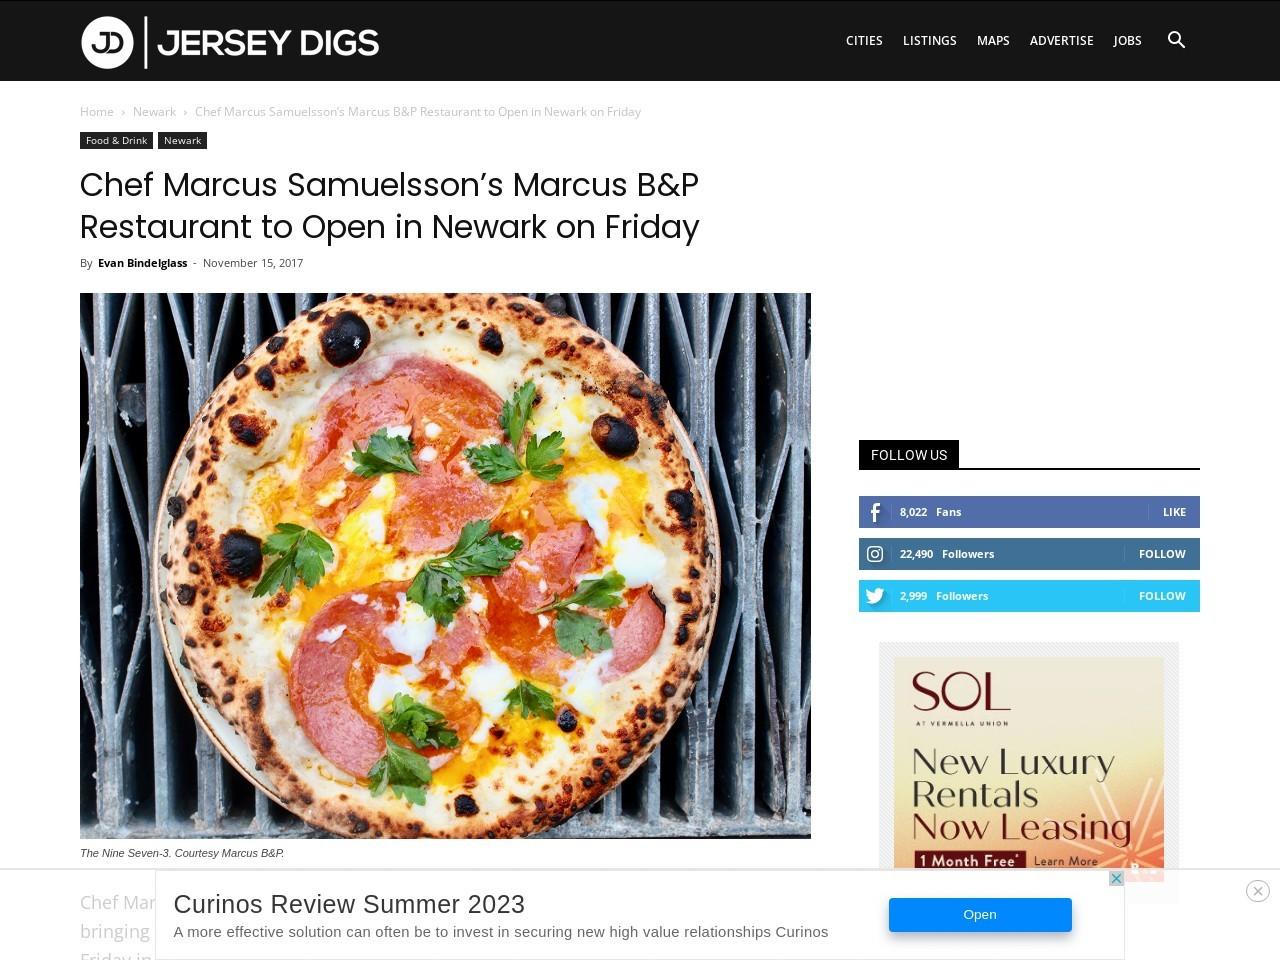 Chef Marcus Samuelsson's Marcus B&P Restaurant to Open in Newark on Friday